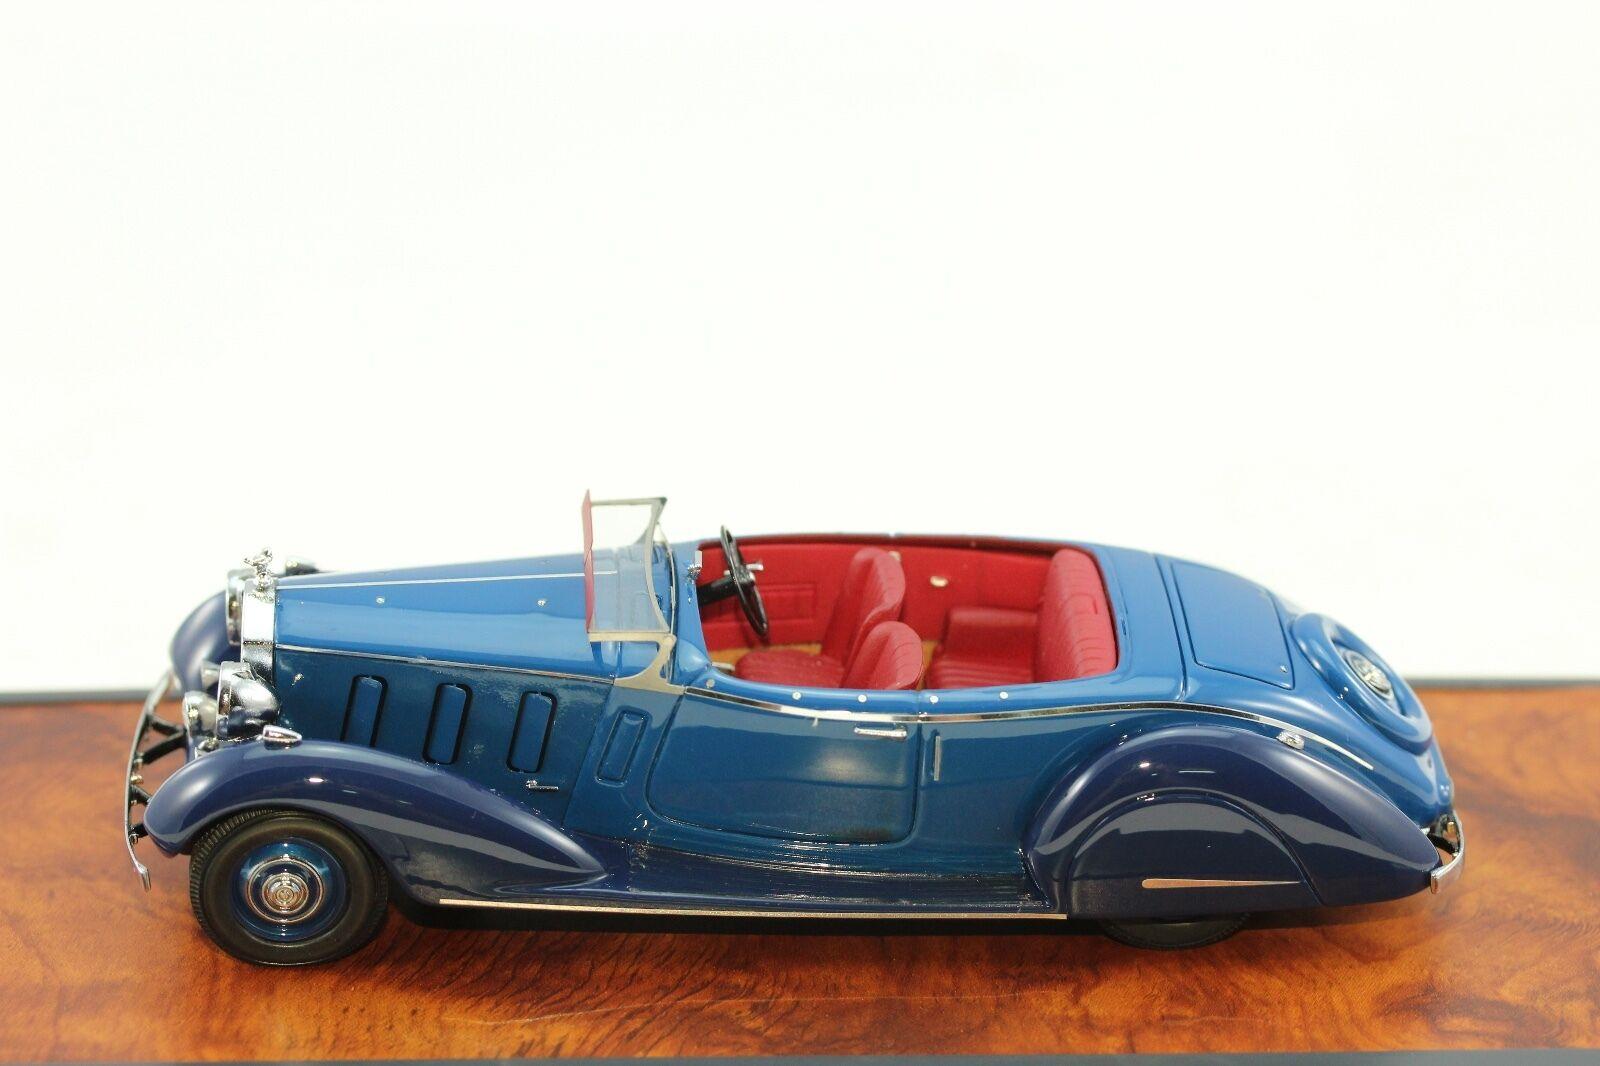 Matrix Rolls Royce Phantom III SPORT TORPEDO 1937 1:43 Matrix mx51705-181 | Soyez Bienvenus En Cours D'utilisation